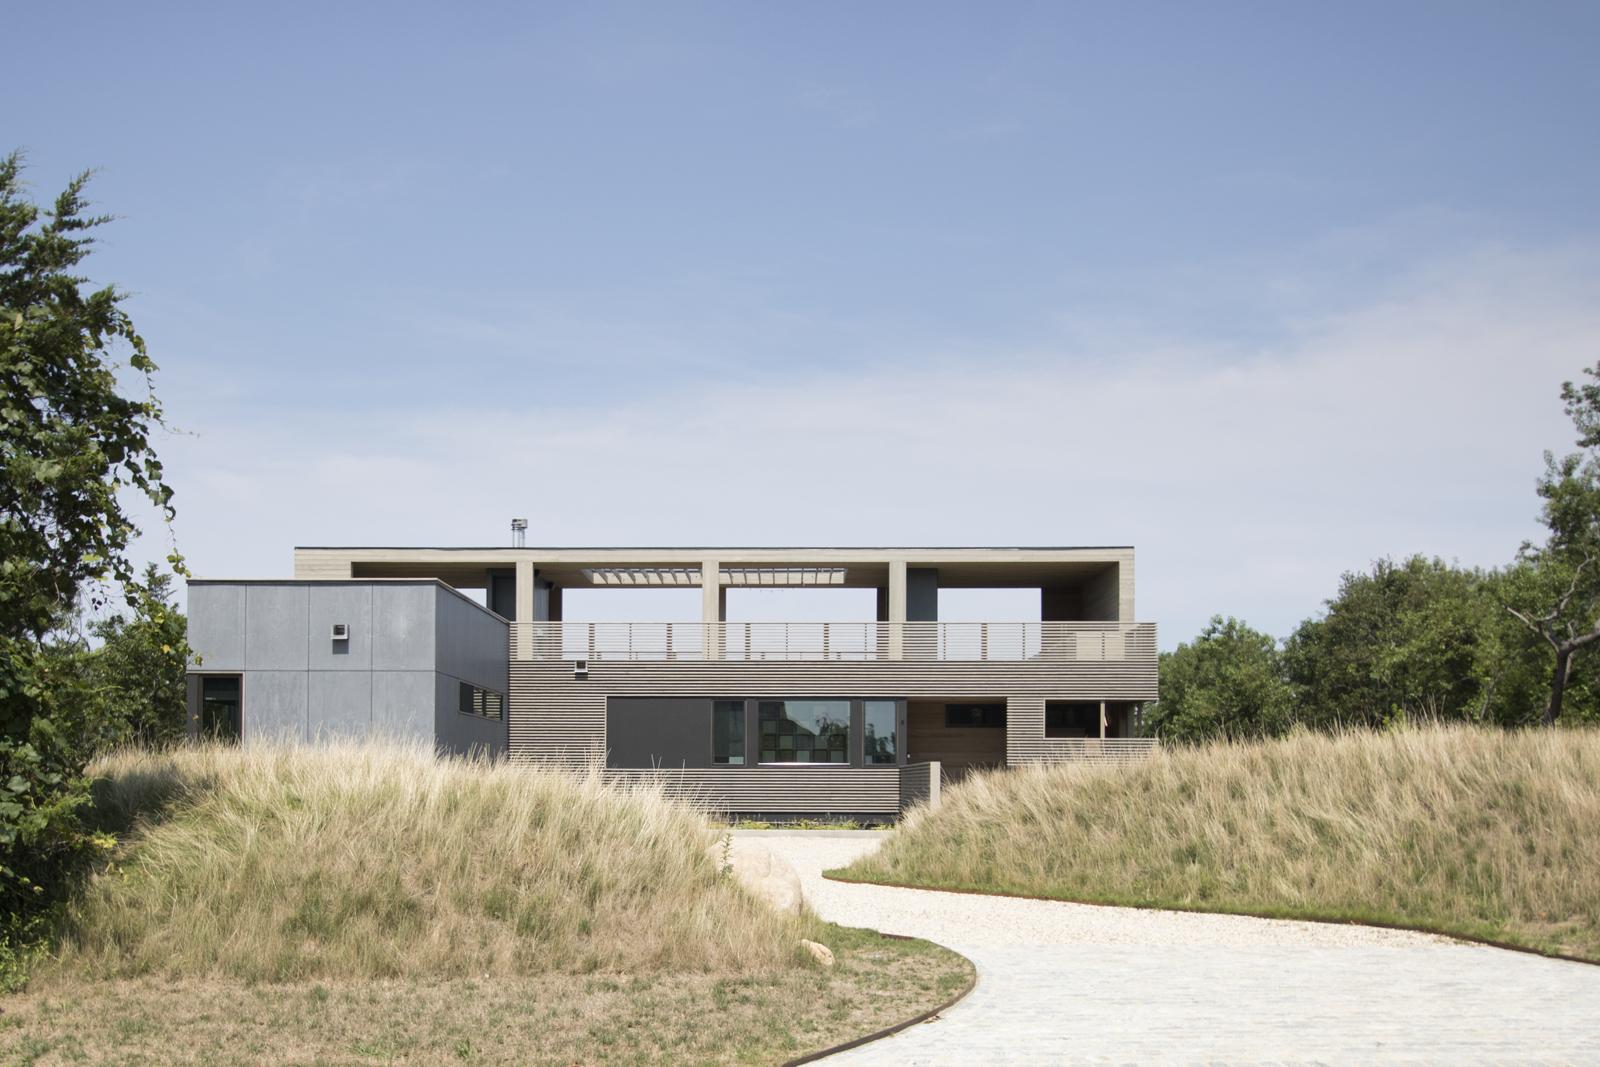 01-res4-resolution-4-architecture-modern-modular-house-prefab-home-north-fork-bluff-house-exterior-facade-elevation.jpg